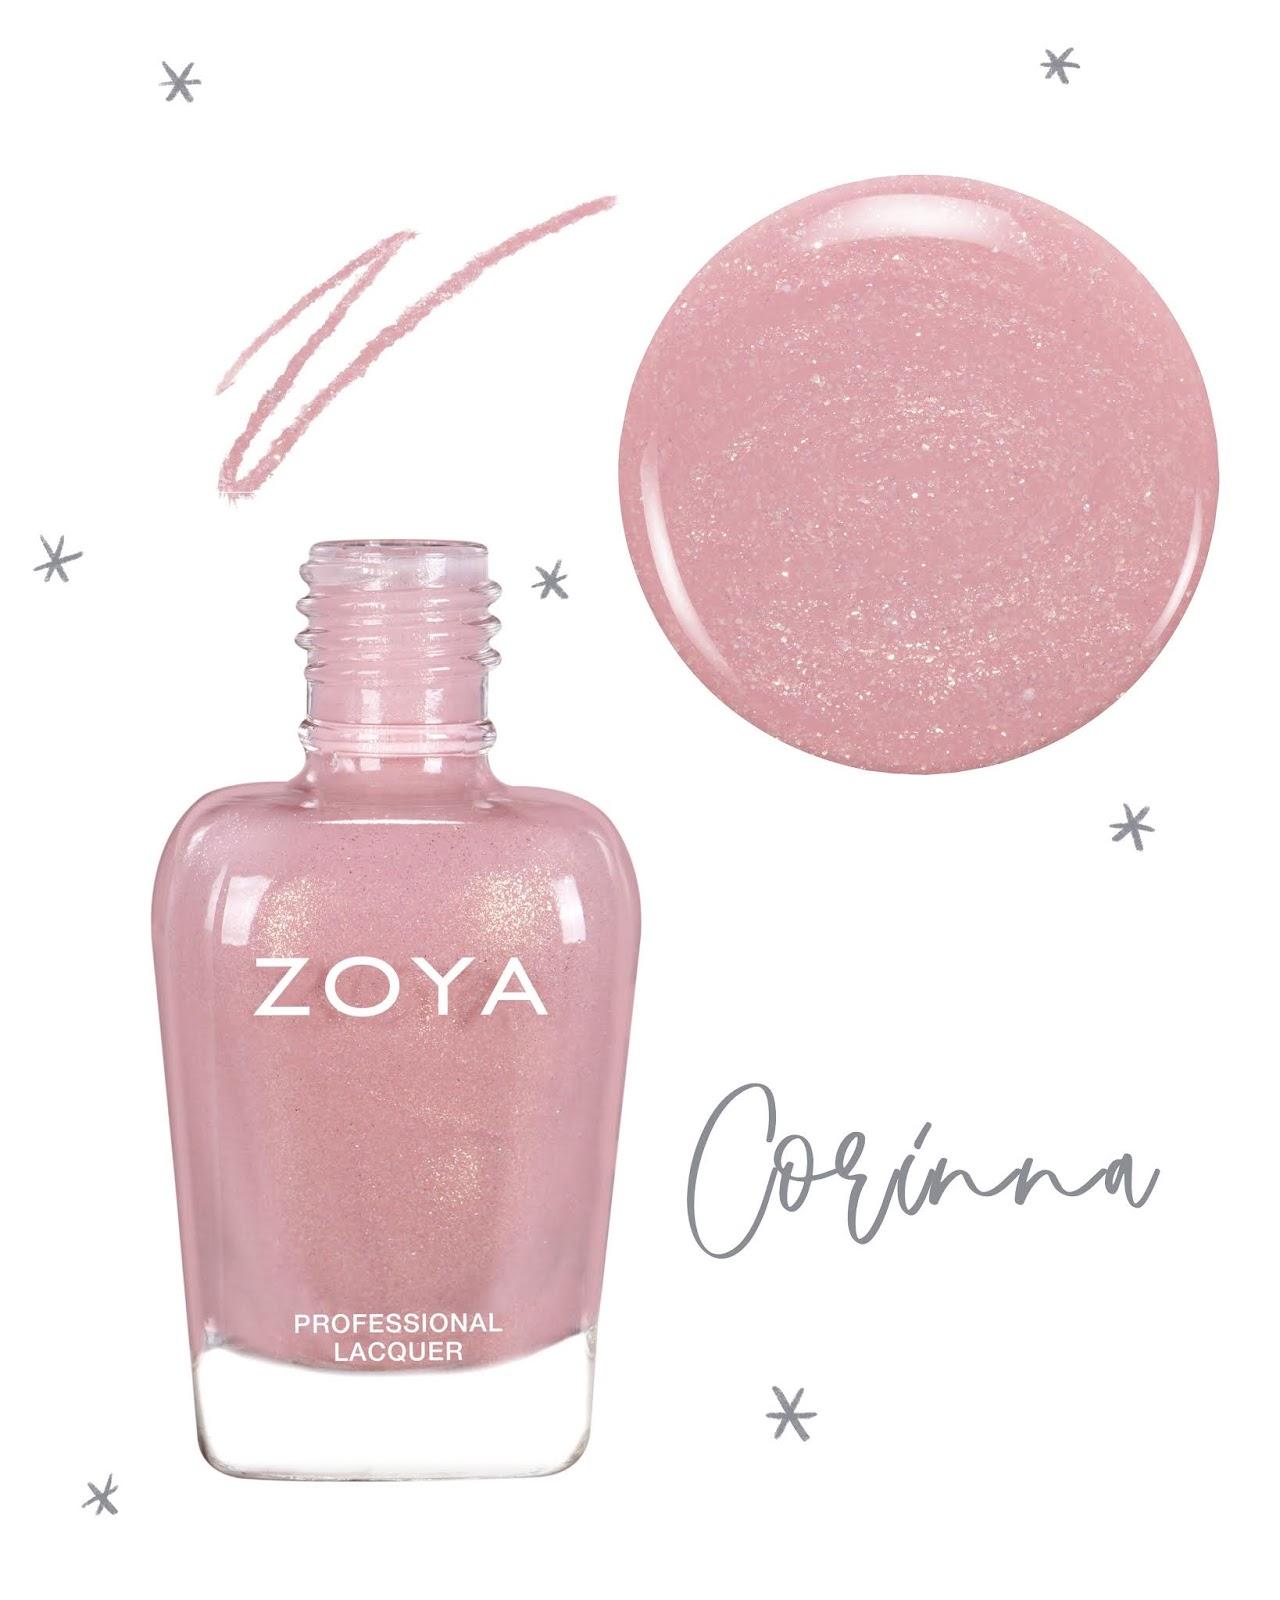 Zoya Corinna